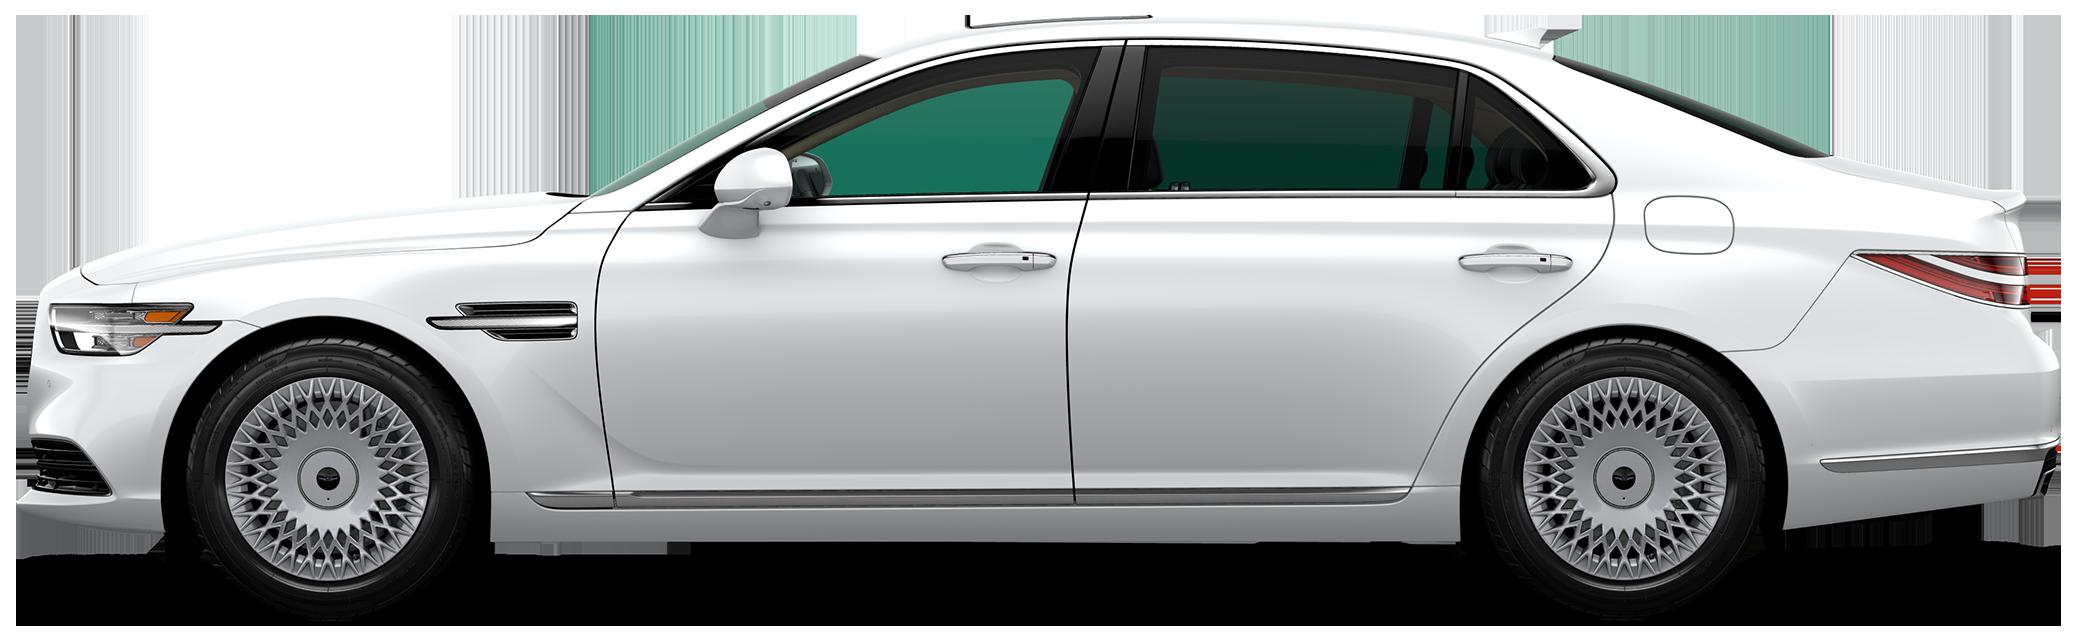 2021 Genesis G90 Sedan 3.3T Premium AWD